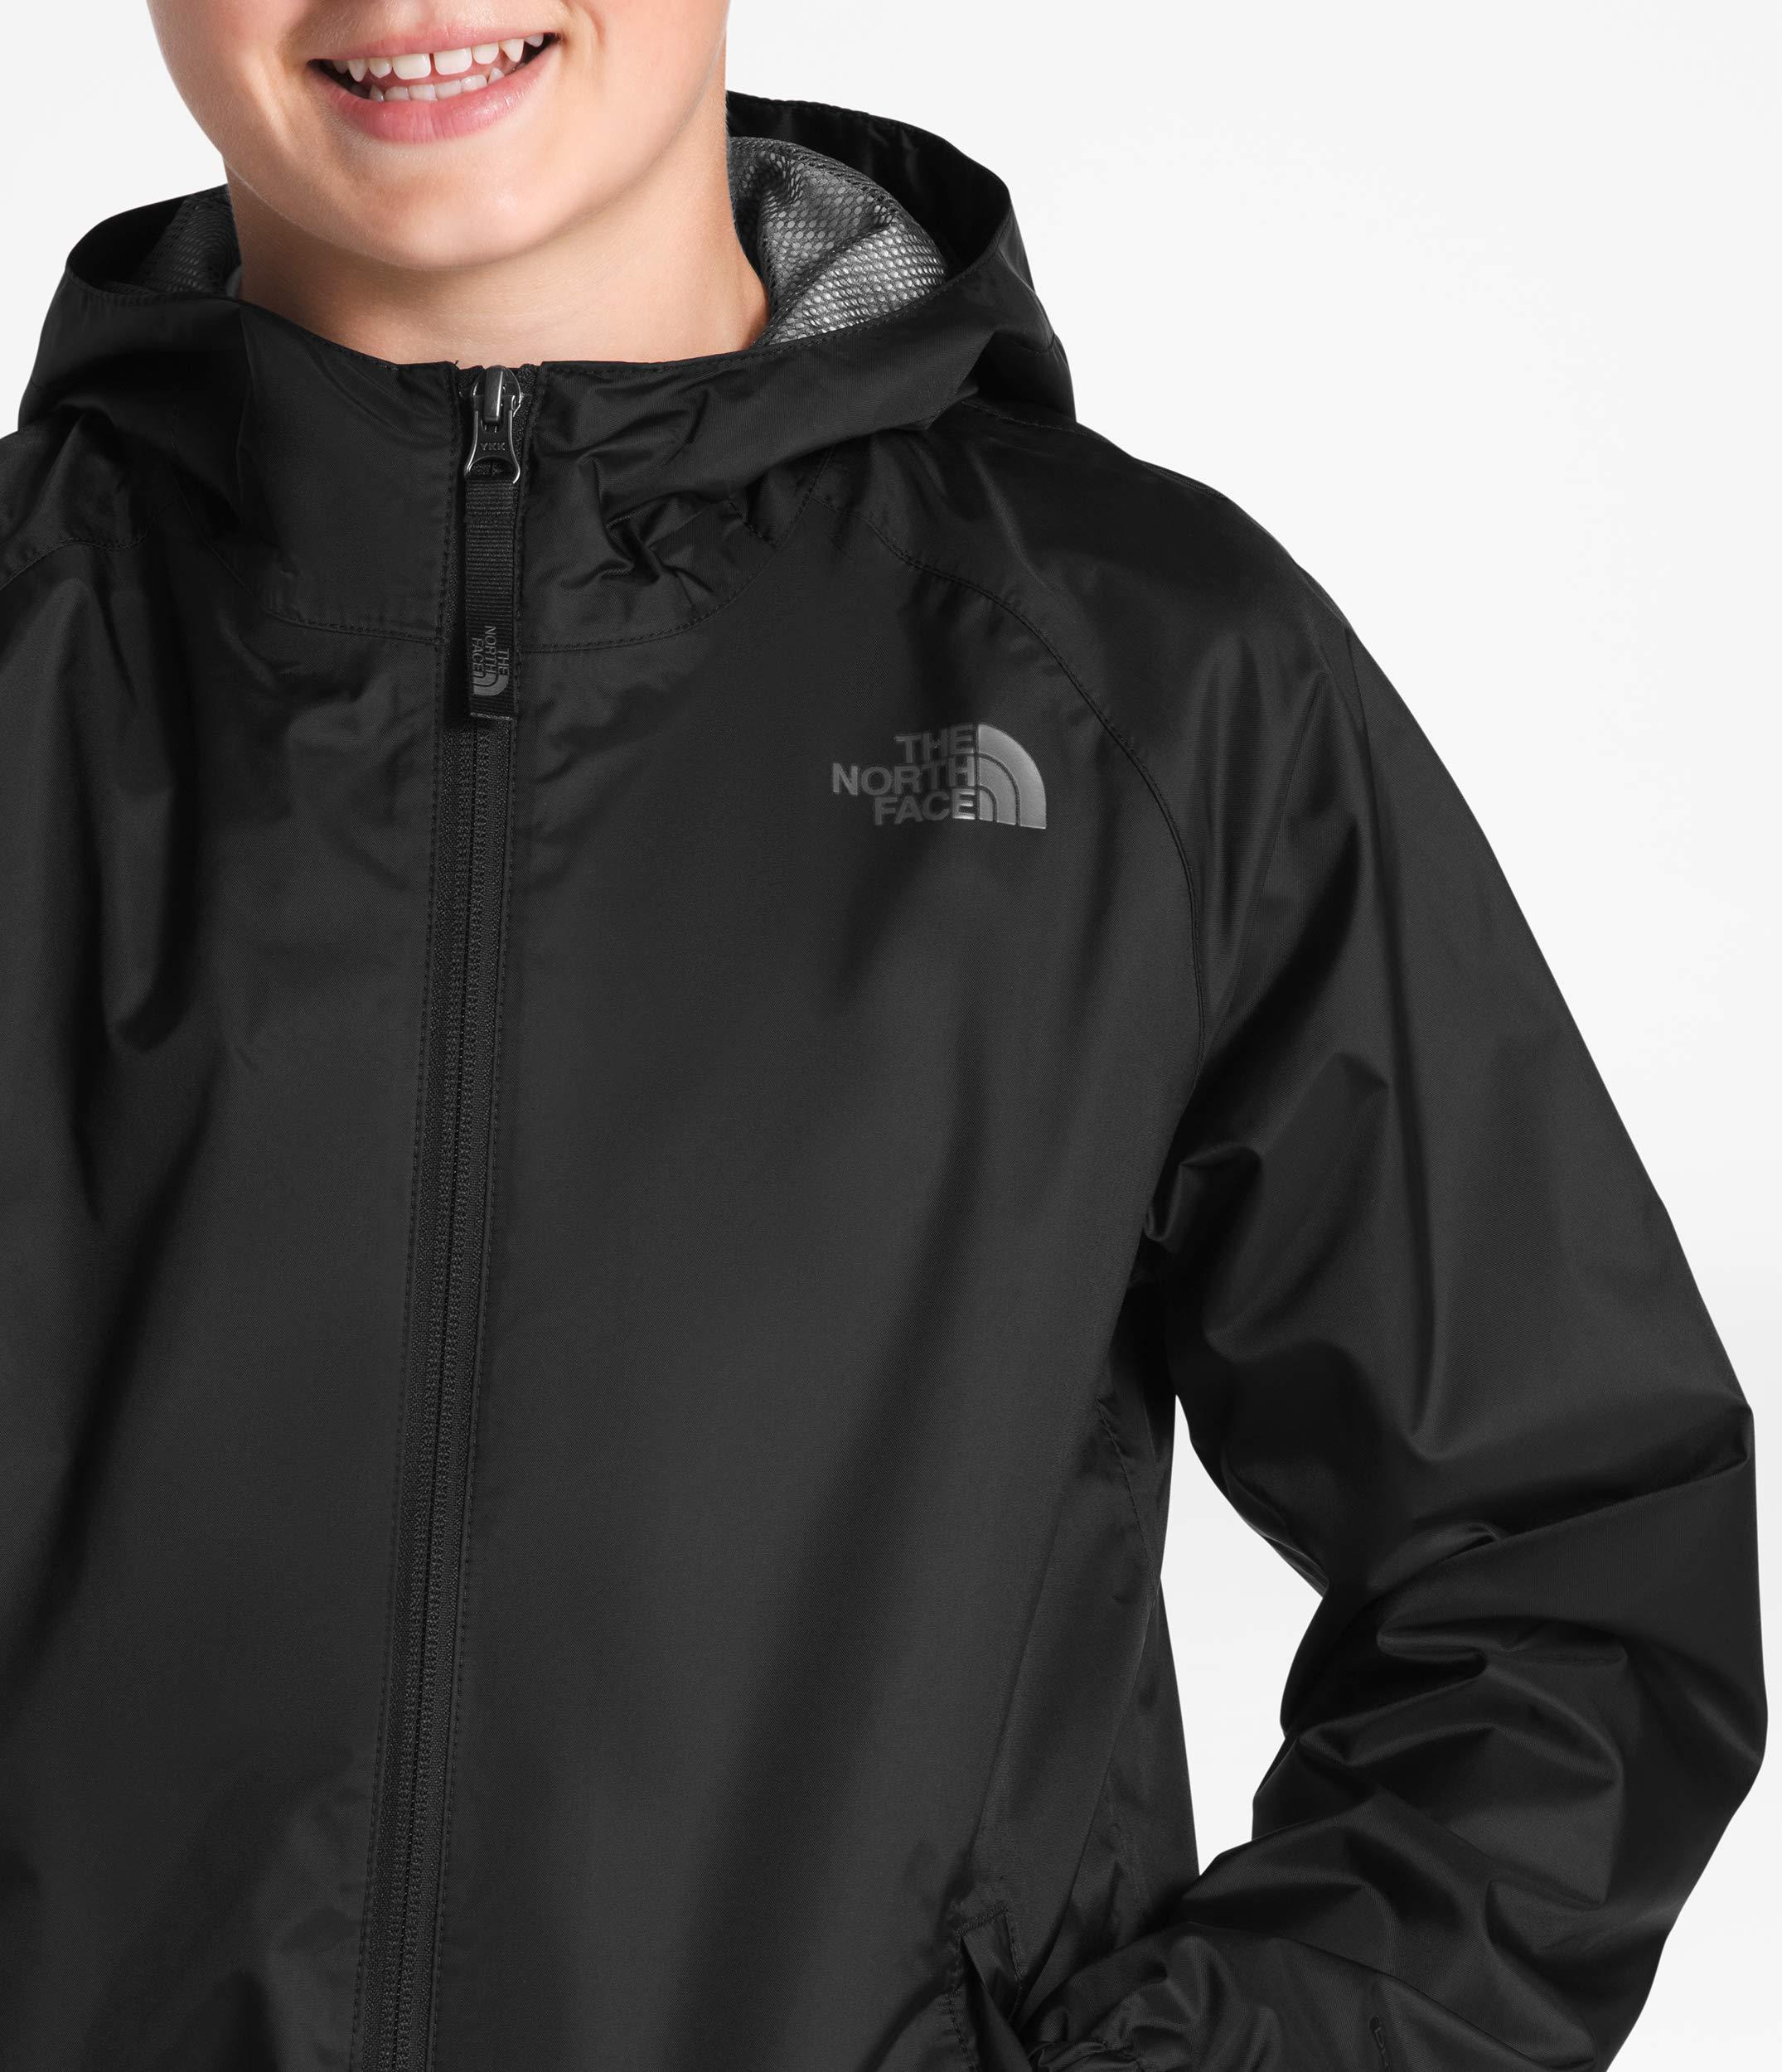 The North Face Kids Boy's Zipline Rain Jacket (Little Kids/Big Kids) TNF Black Large by The North Face (Image #3)